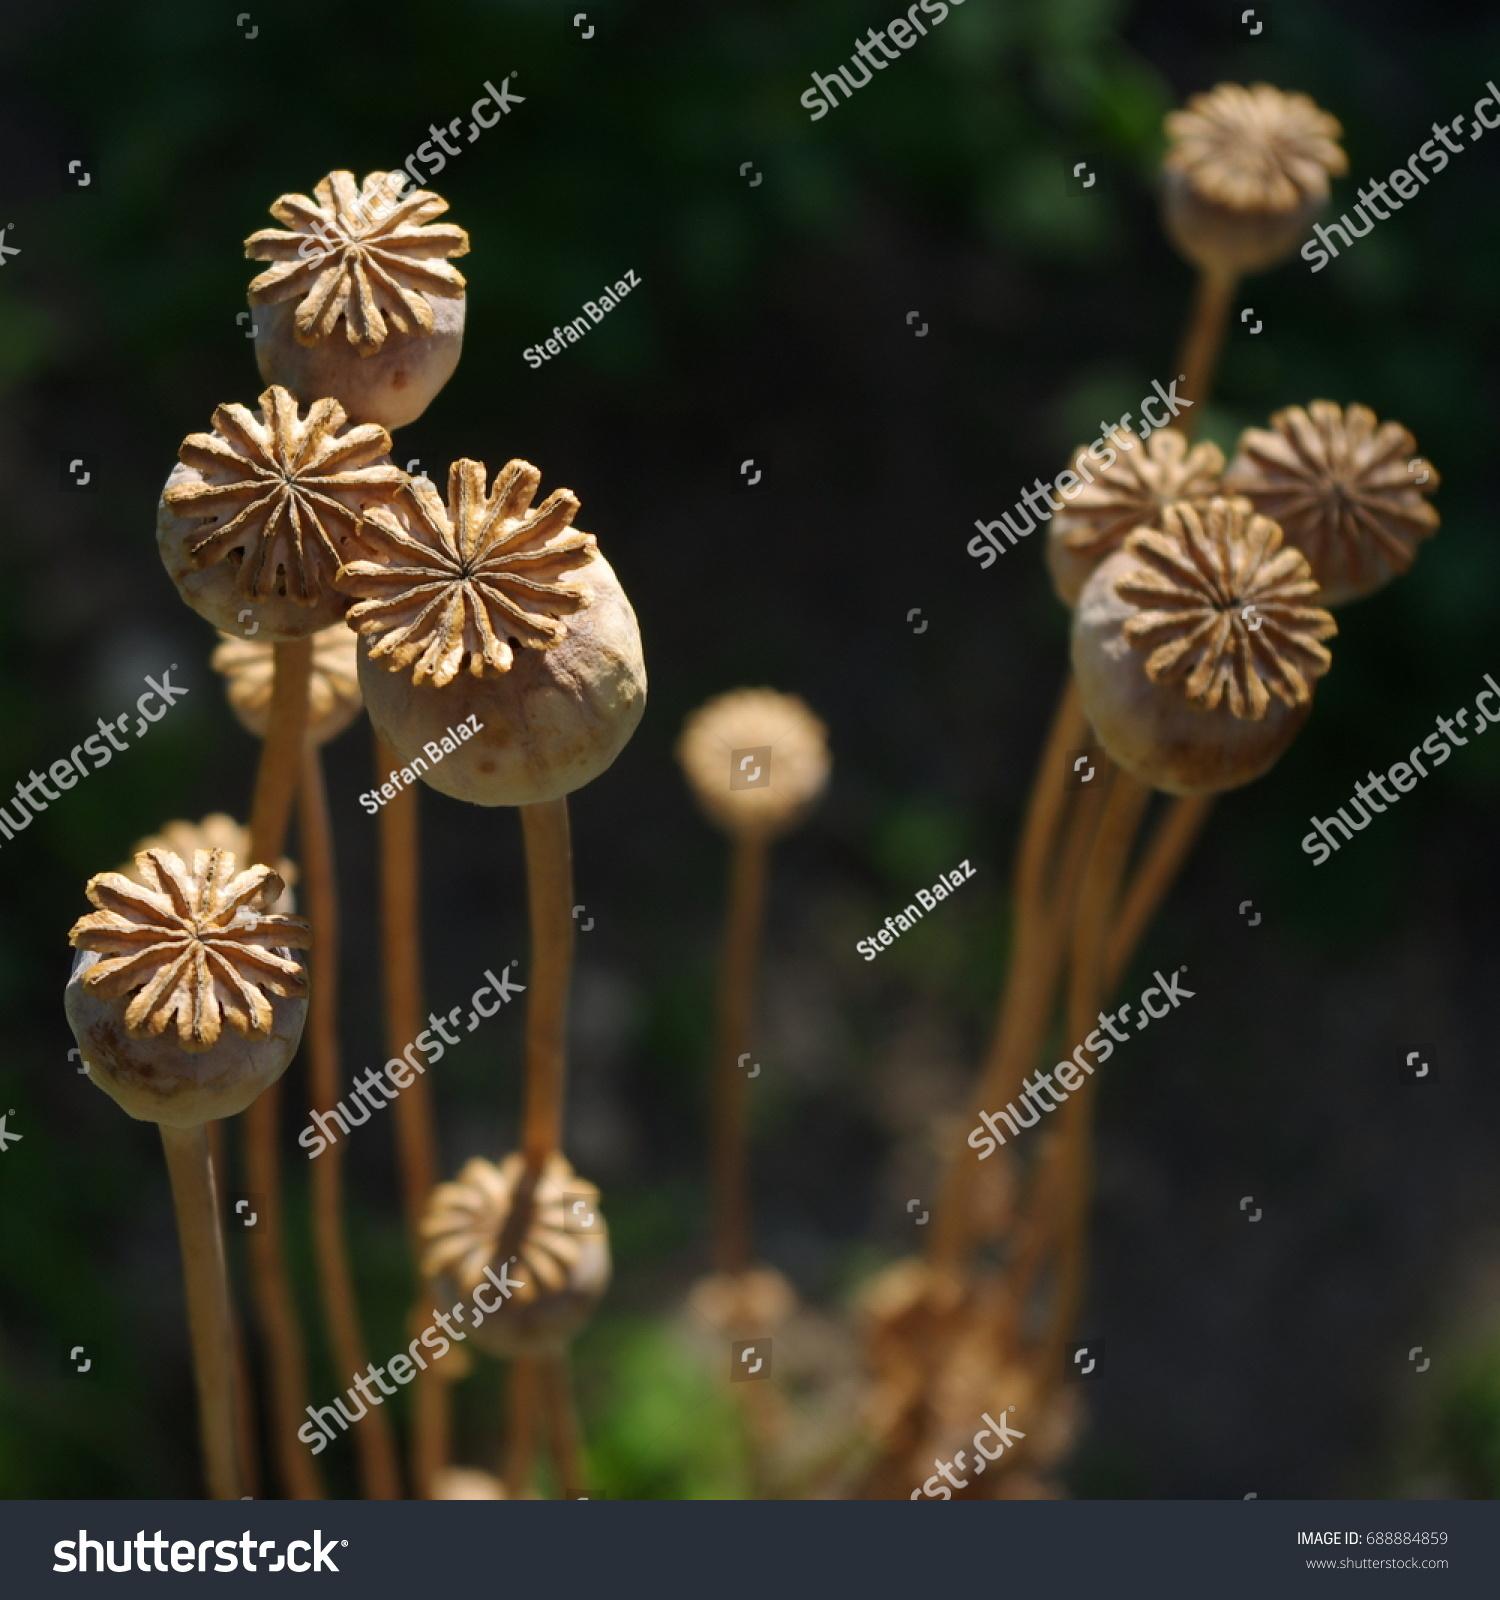 Dried poppy head opium drugs plant stock photo image royalty free opium drugs plant poppy seed heads opium drugs izmirmasajfo